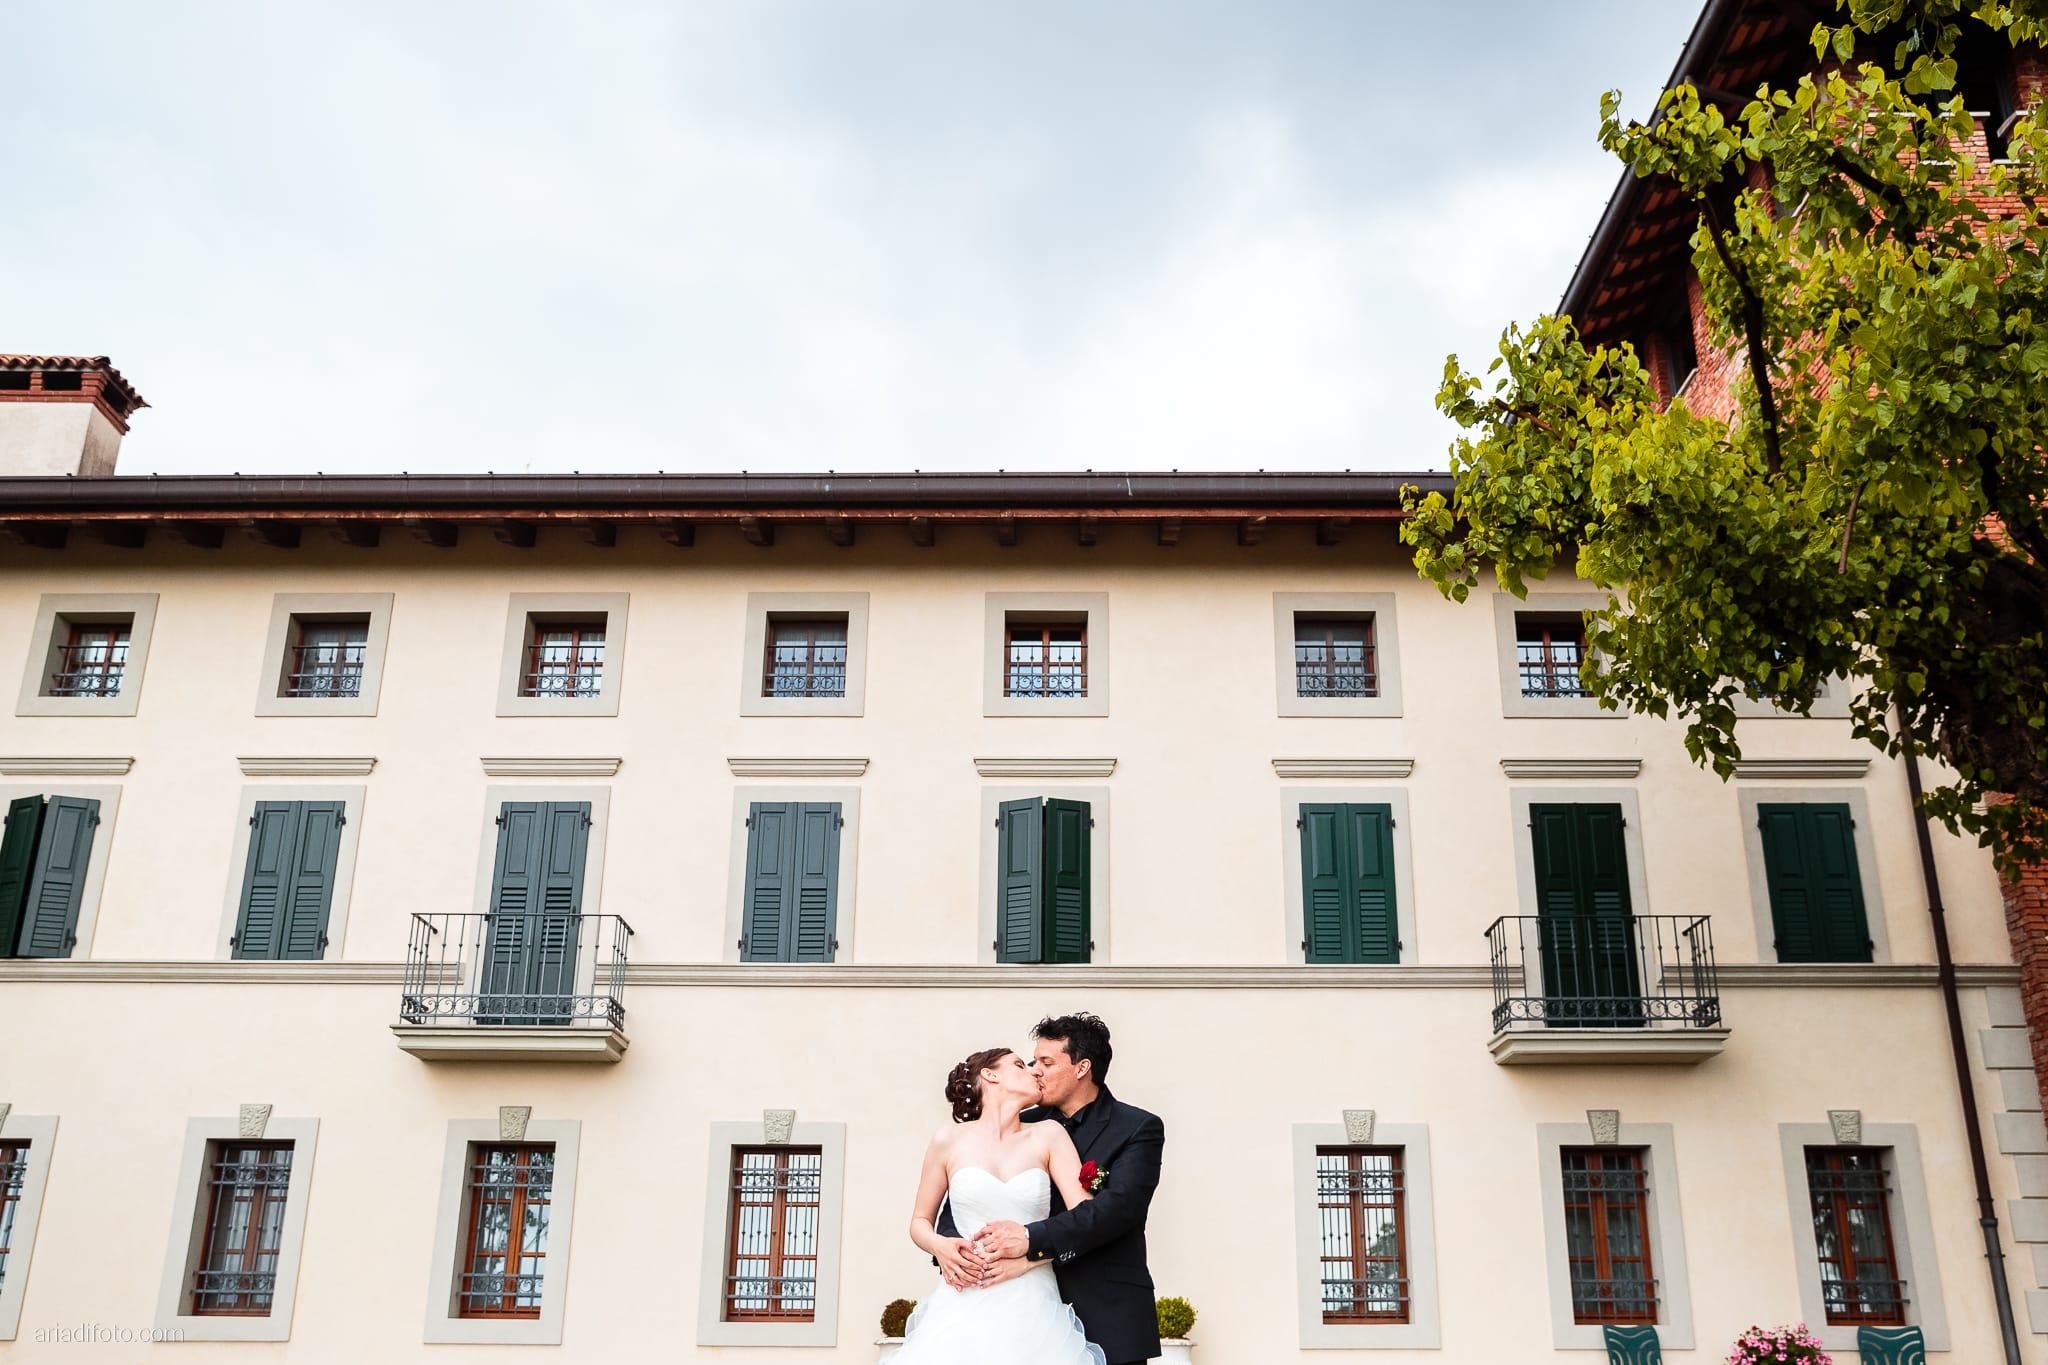 Sarah Matteo Matrimonio Moruzzo Agriturismo Il Vagabondo Buttrio Udine ritratti sposi